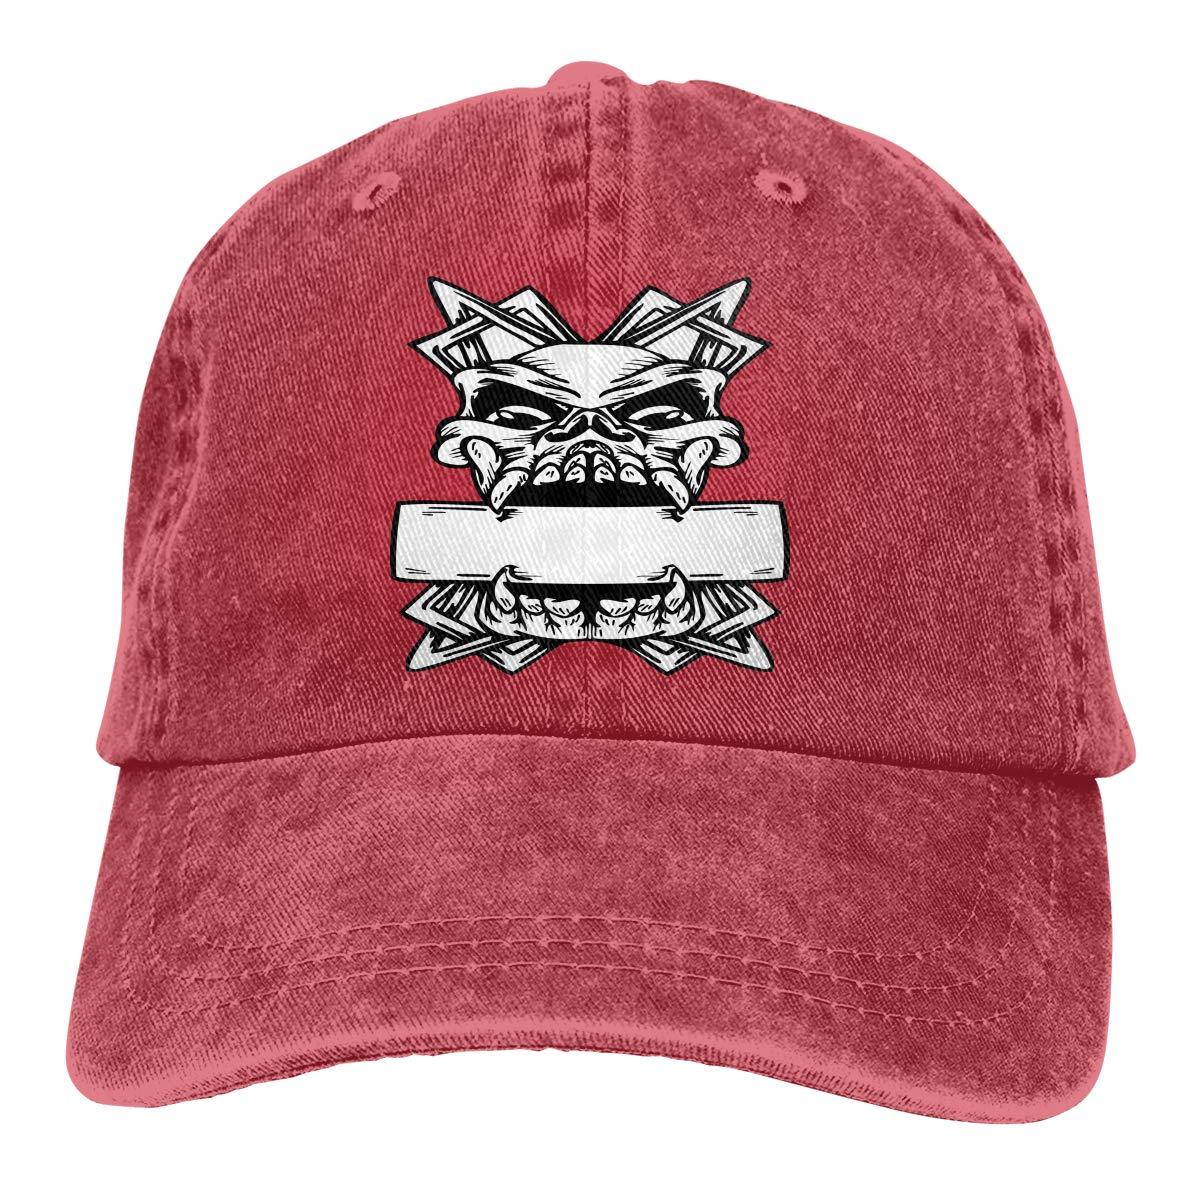 3 HU MOVR Taro Graffiti Cowboy Hat Baseball Hats Fish Adjustable Caps for Mens Womens